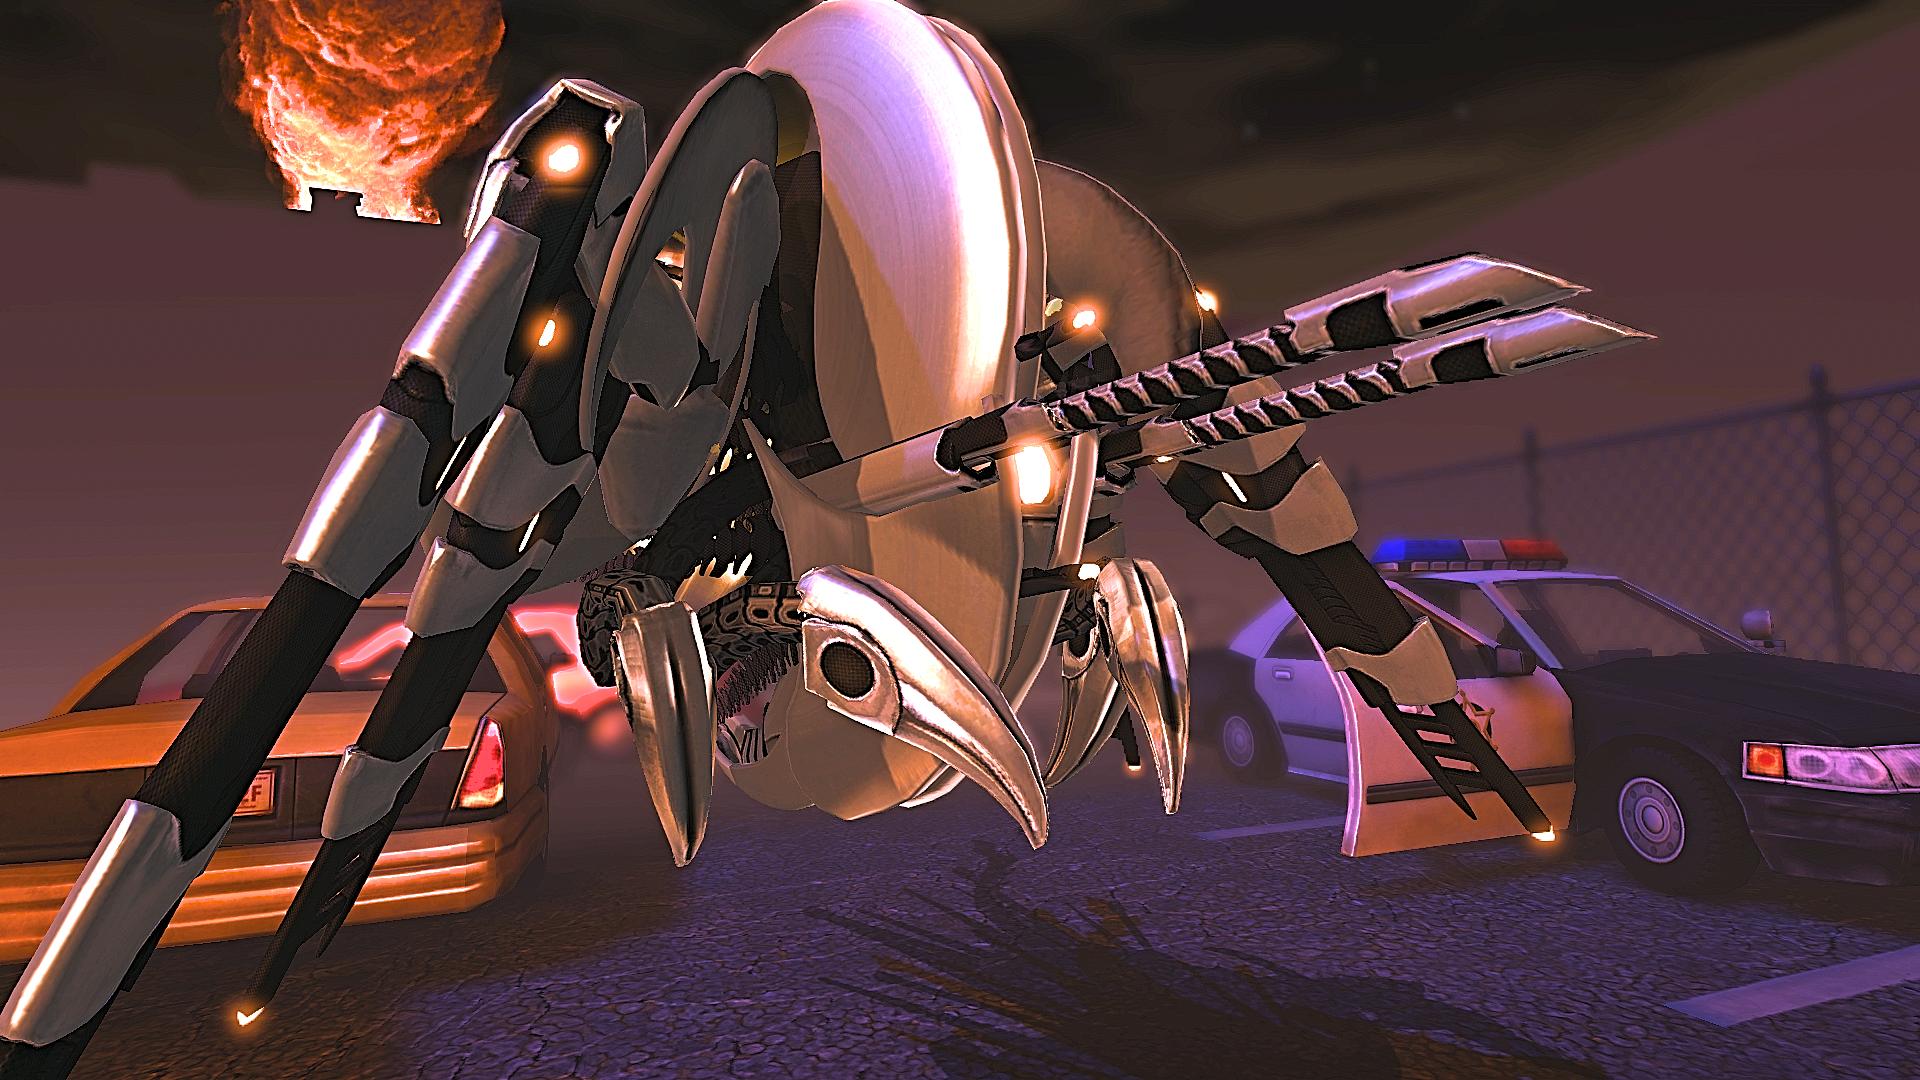 xcomgame 2017-10-19 21-41-20-961 (2).png - XCOM: Enemy Unknown